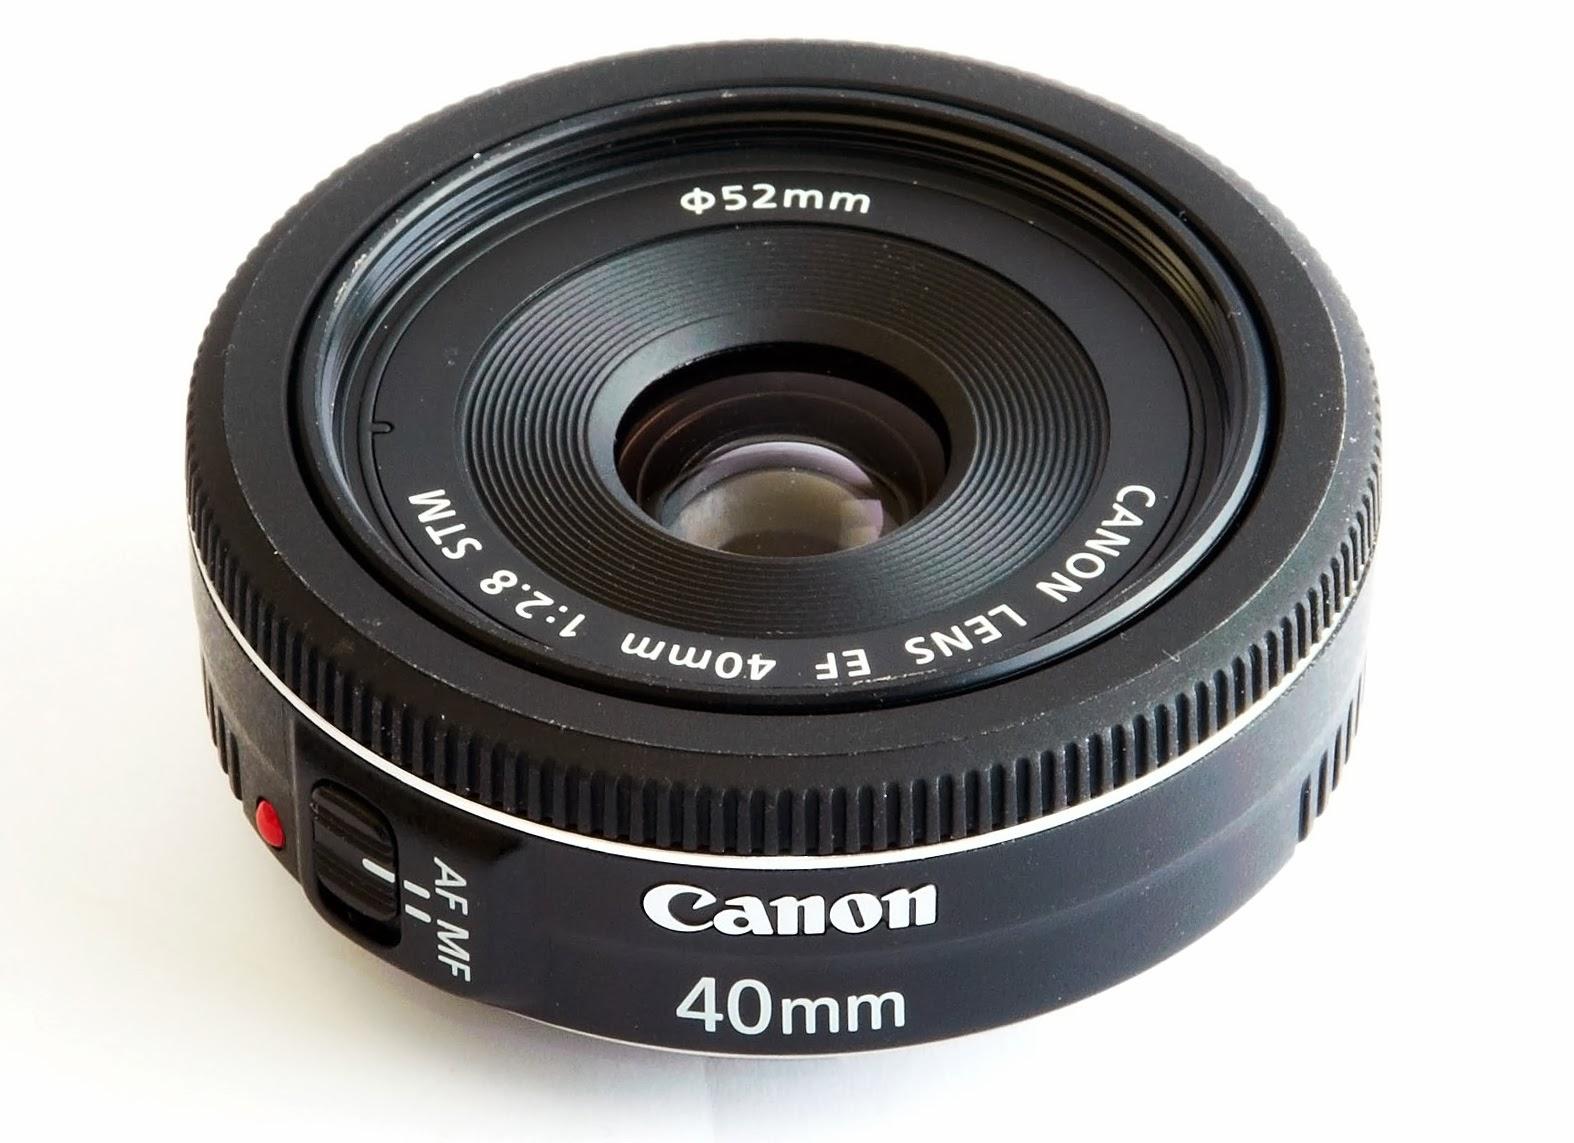 Harga Spesifikasi Lensa Canon EF 40mm f/2.8 STM Terbaru